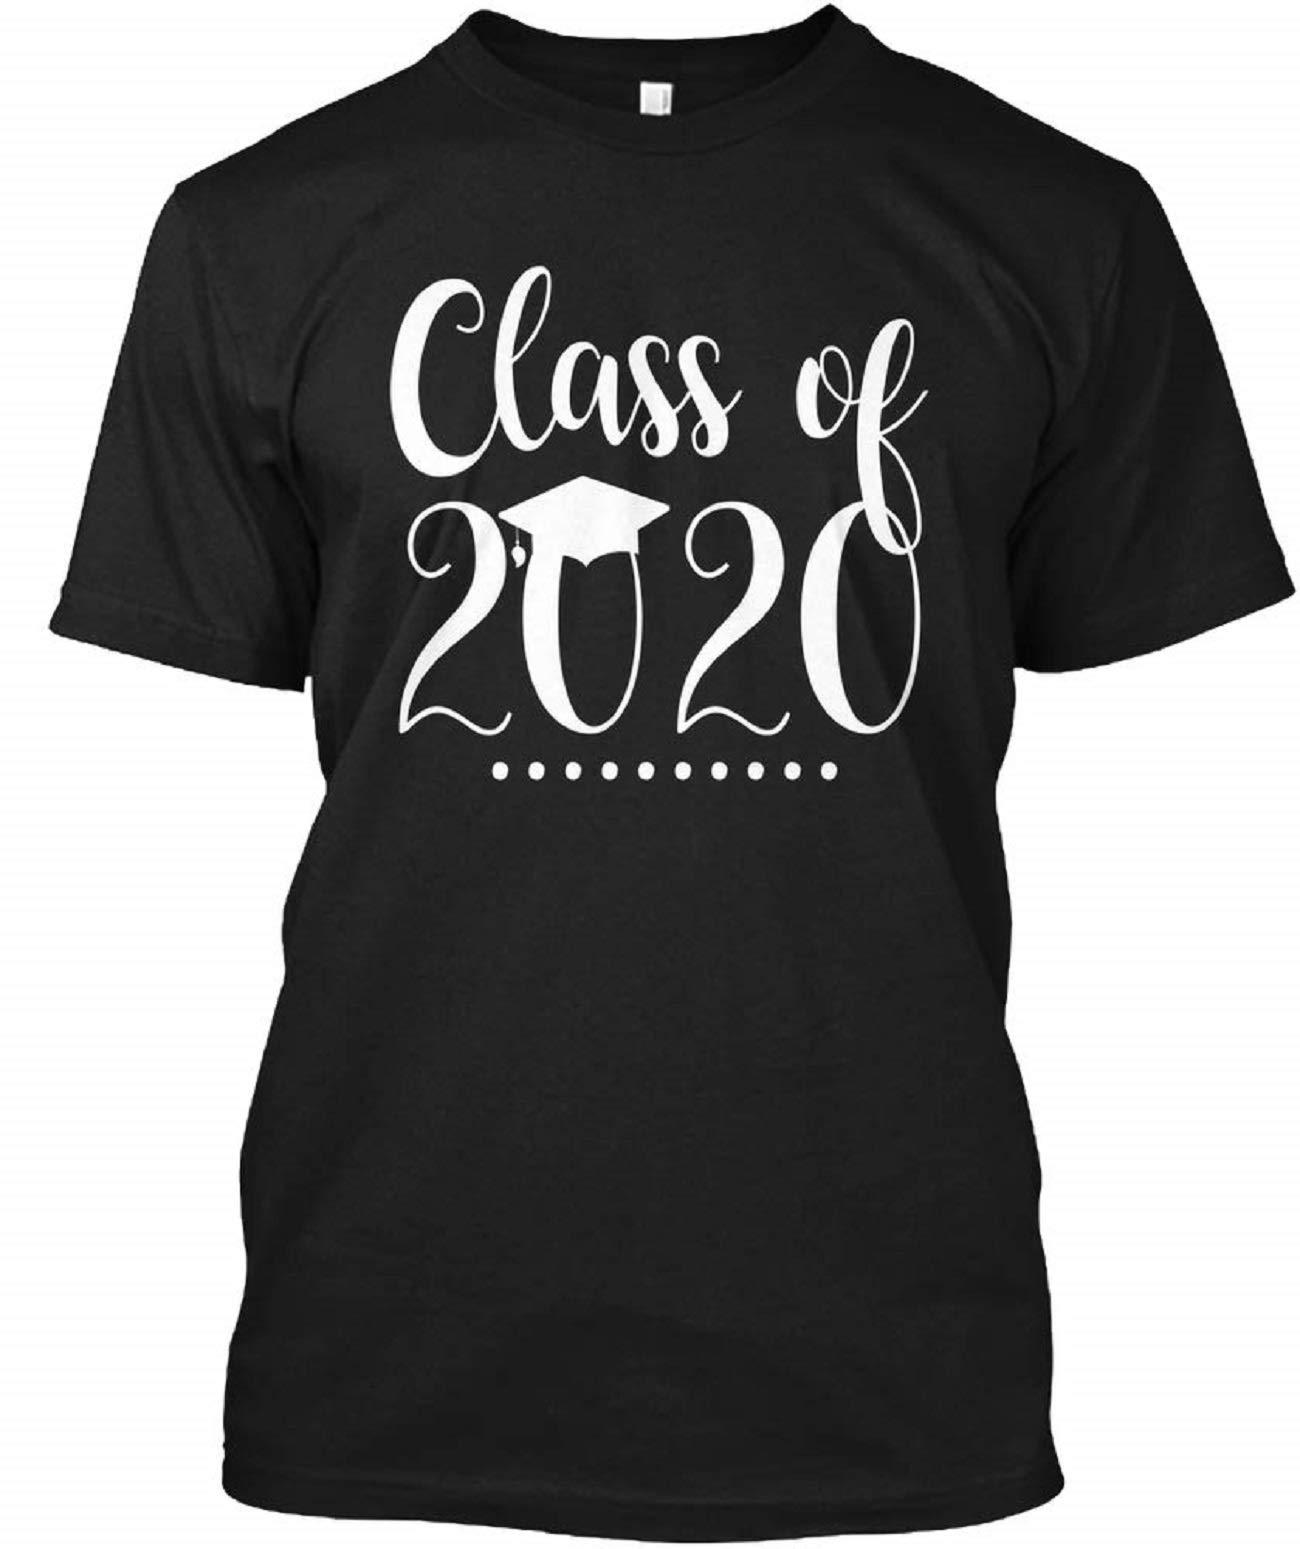 Class Of 2020 Senior Graduation T Shirt For Funny Letter Print Short Sleeve